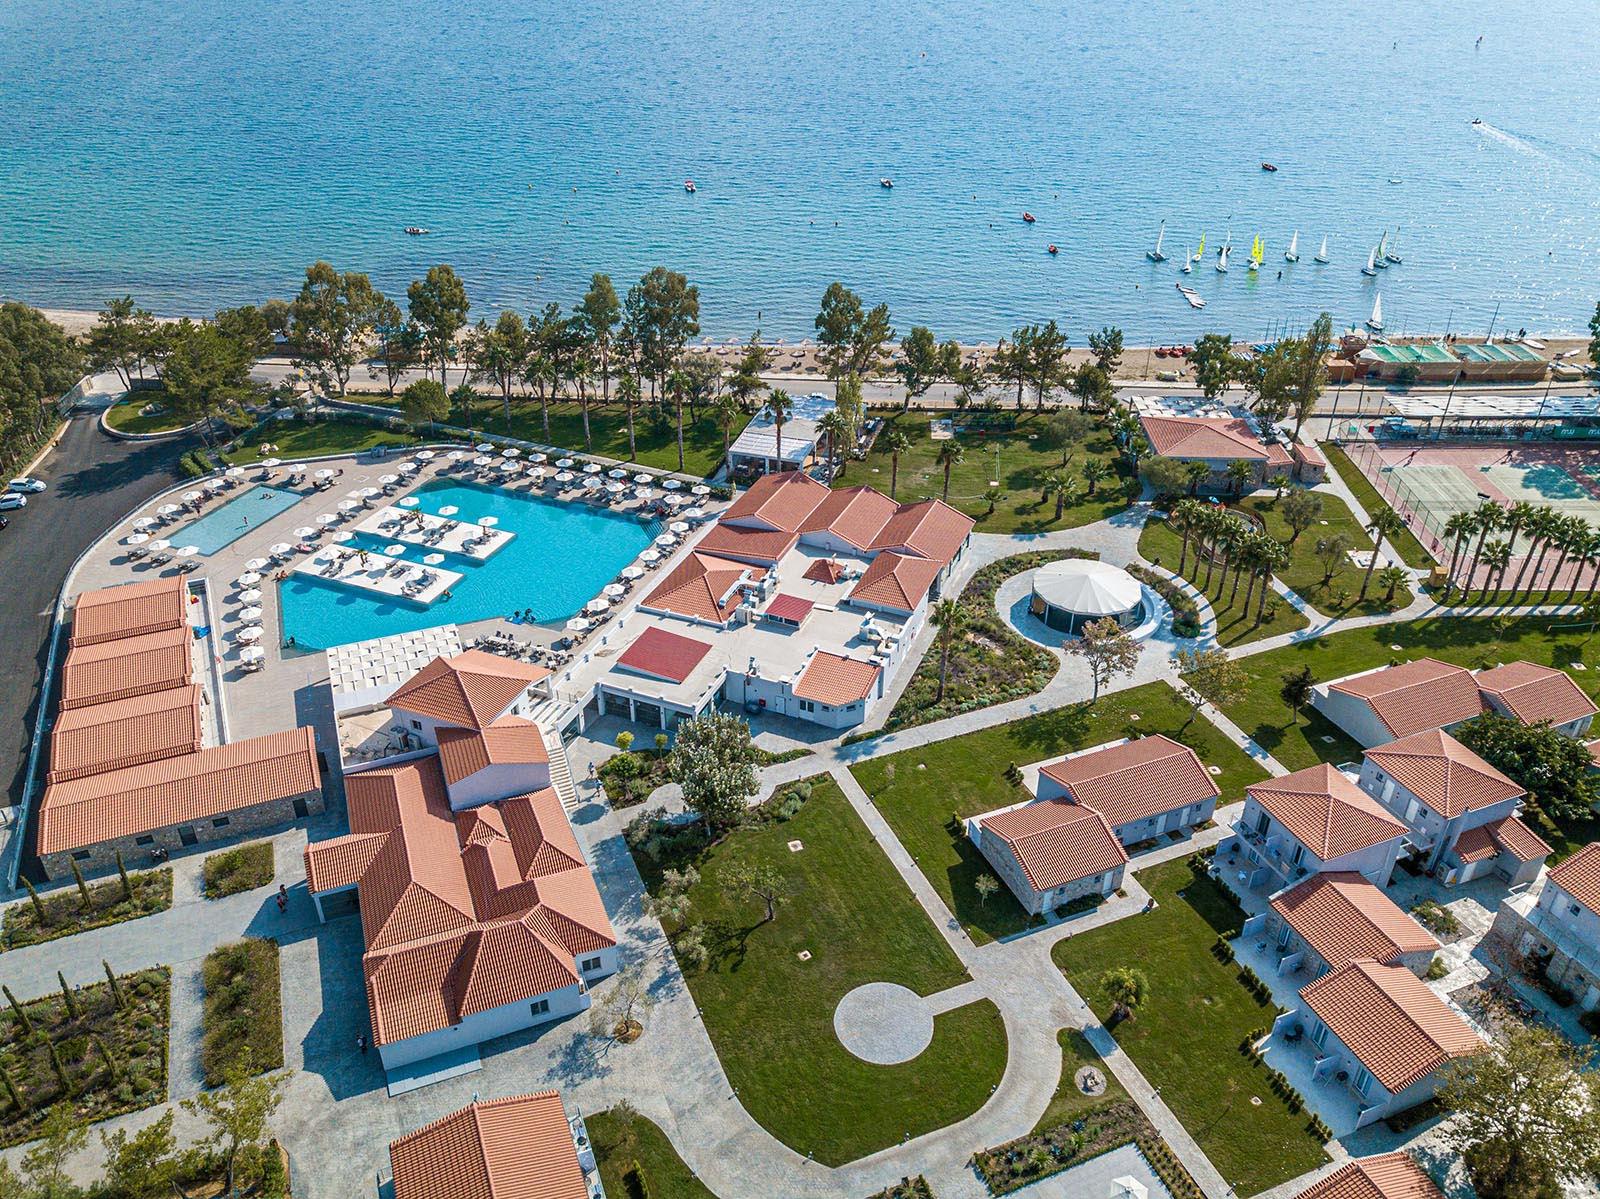 Paleros-Beach-Resort-Luxury-Hotel-Gallery-3-1